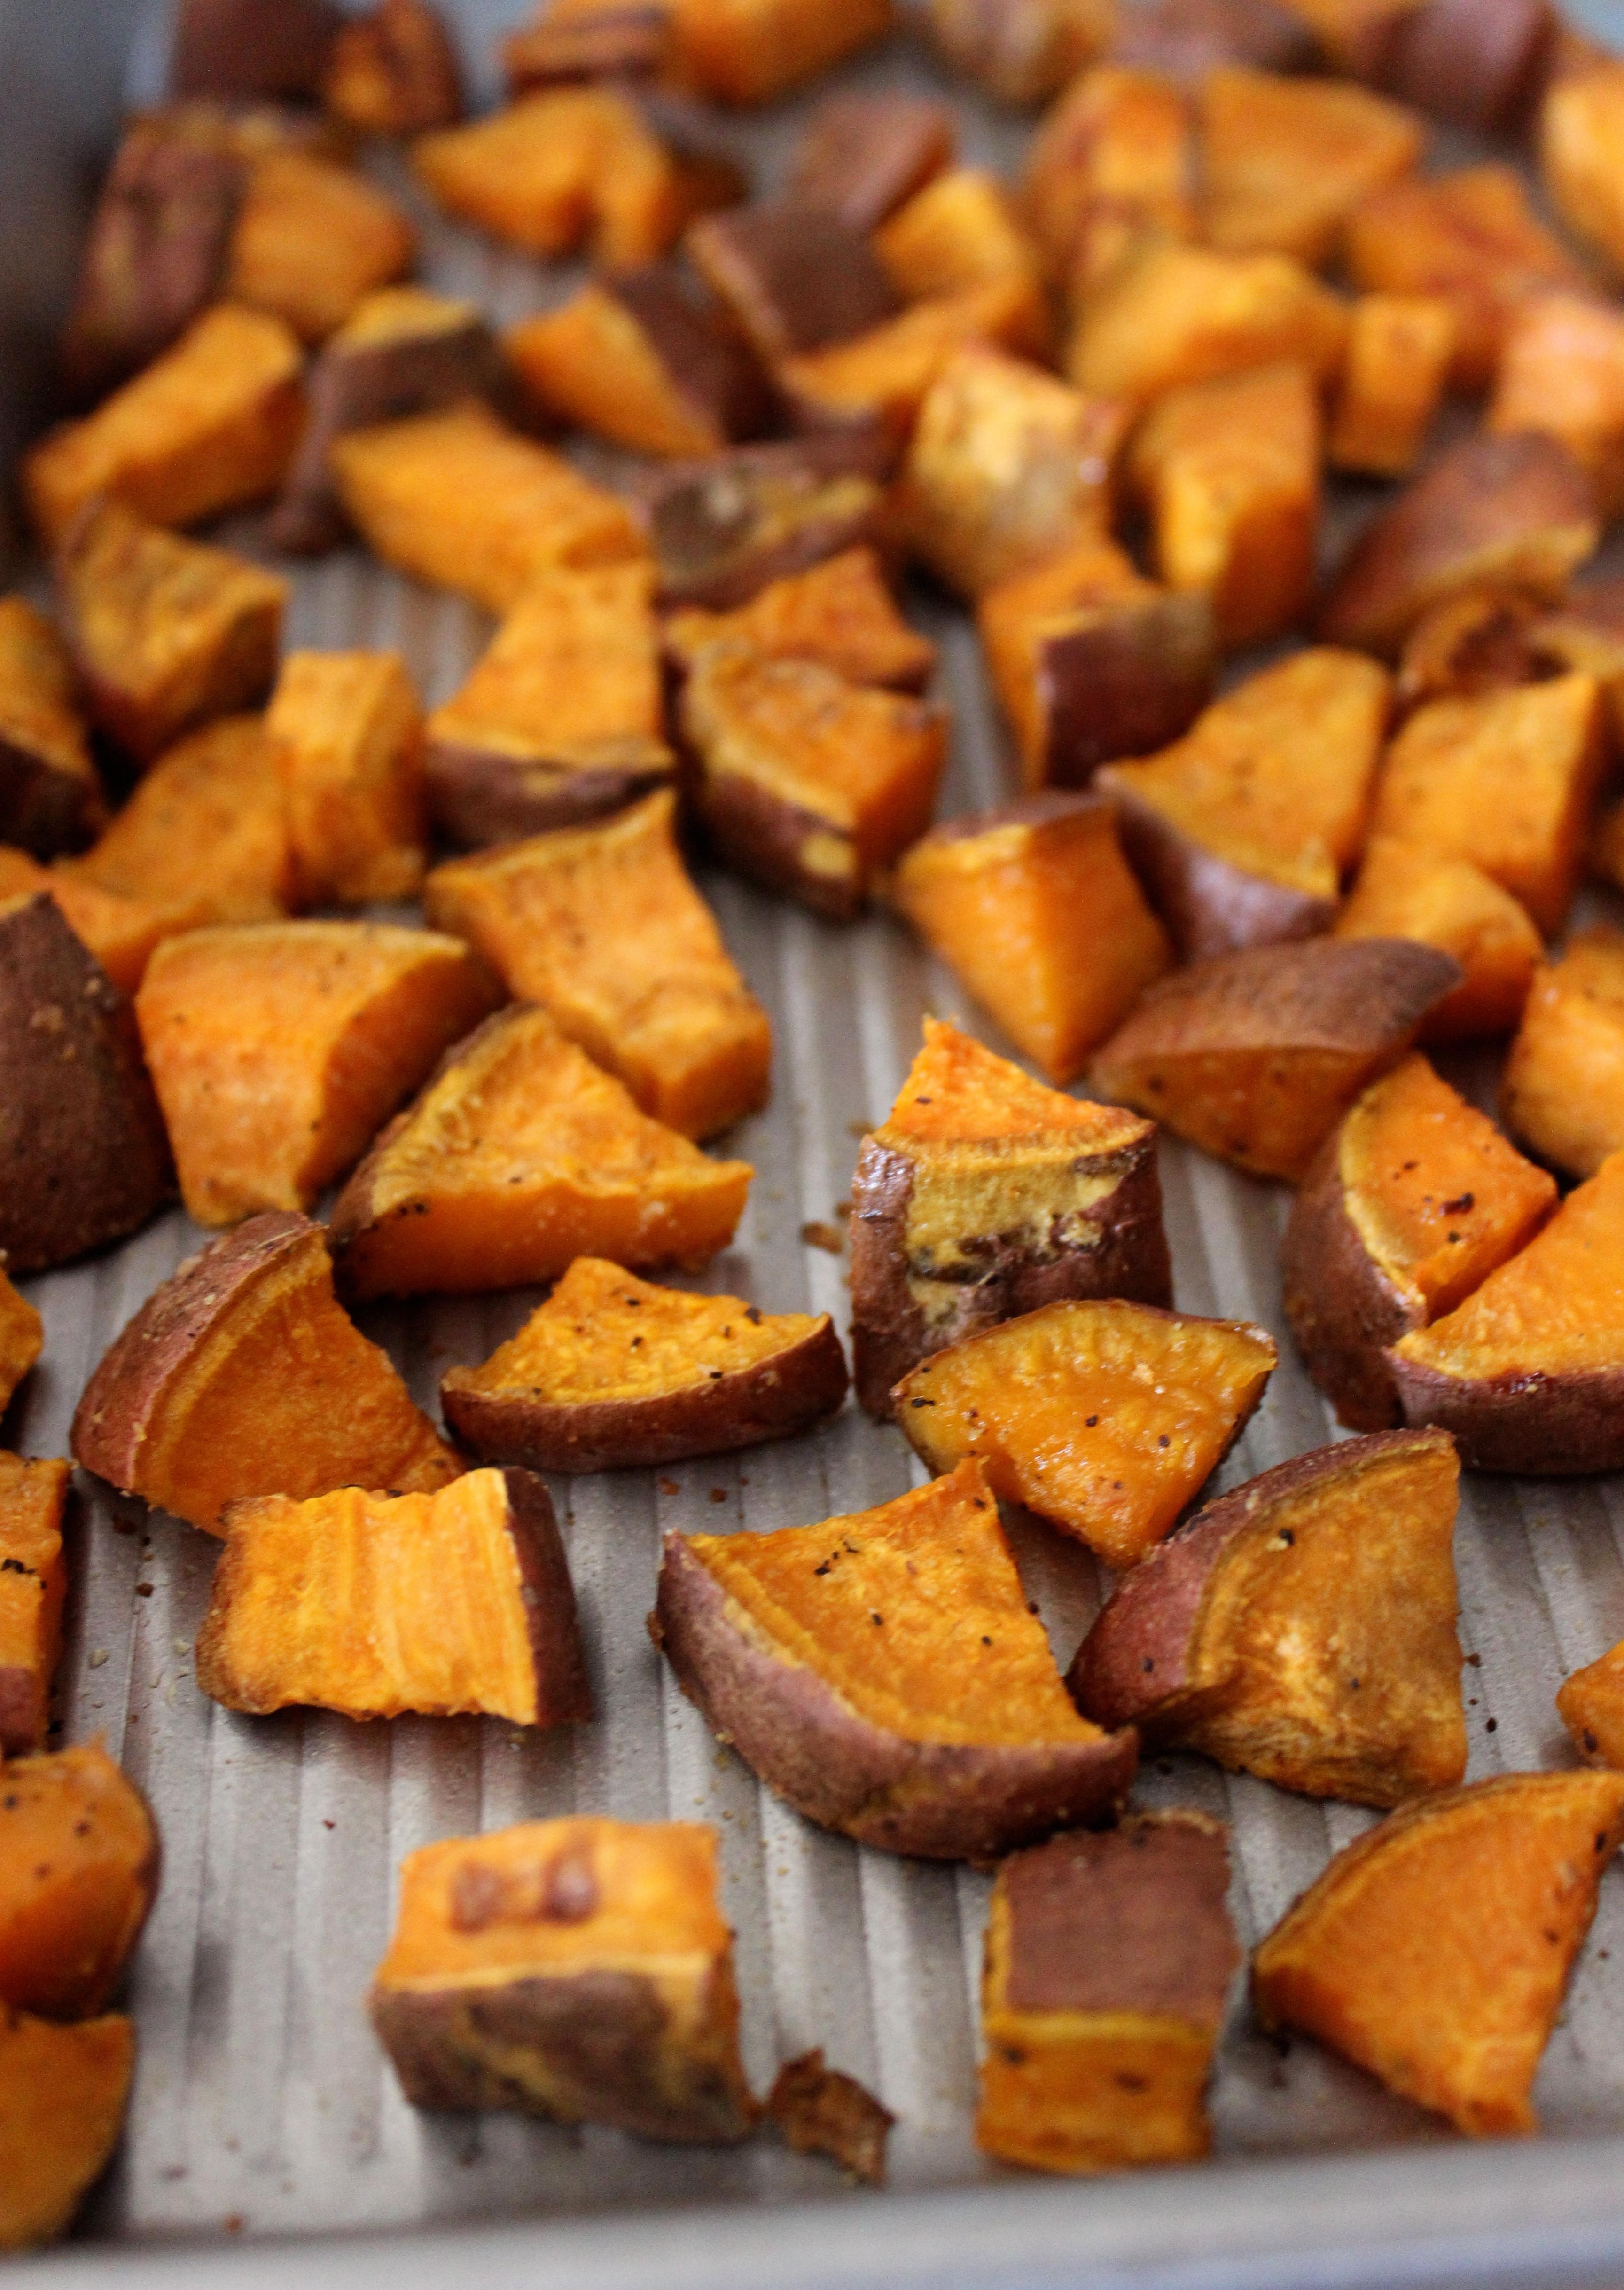 How Long Does It Take To Bake A Sweet Potato  How long does it take to roast a sweet potato